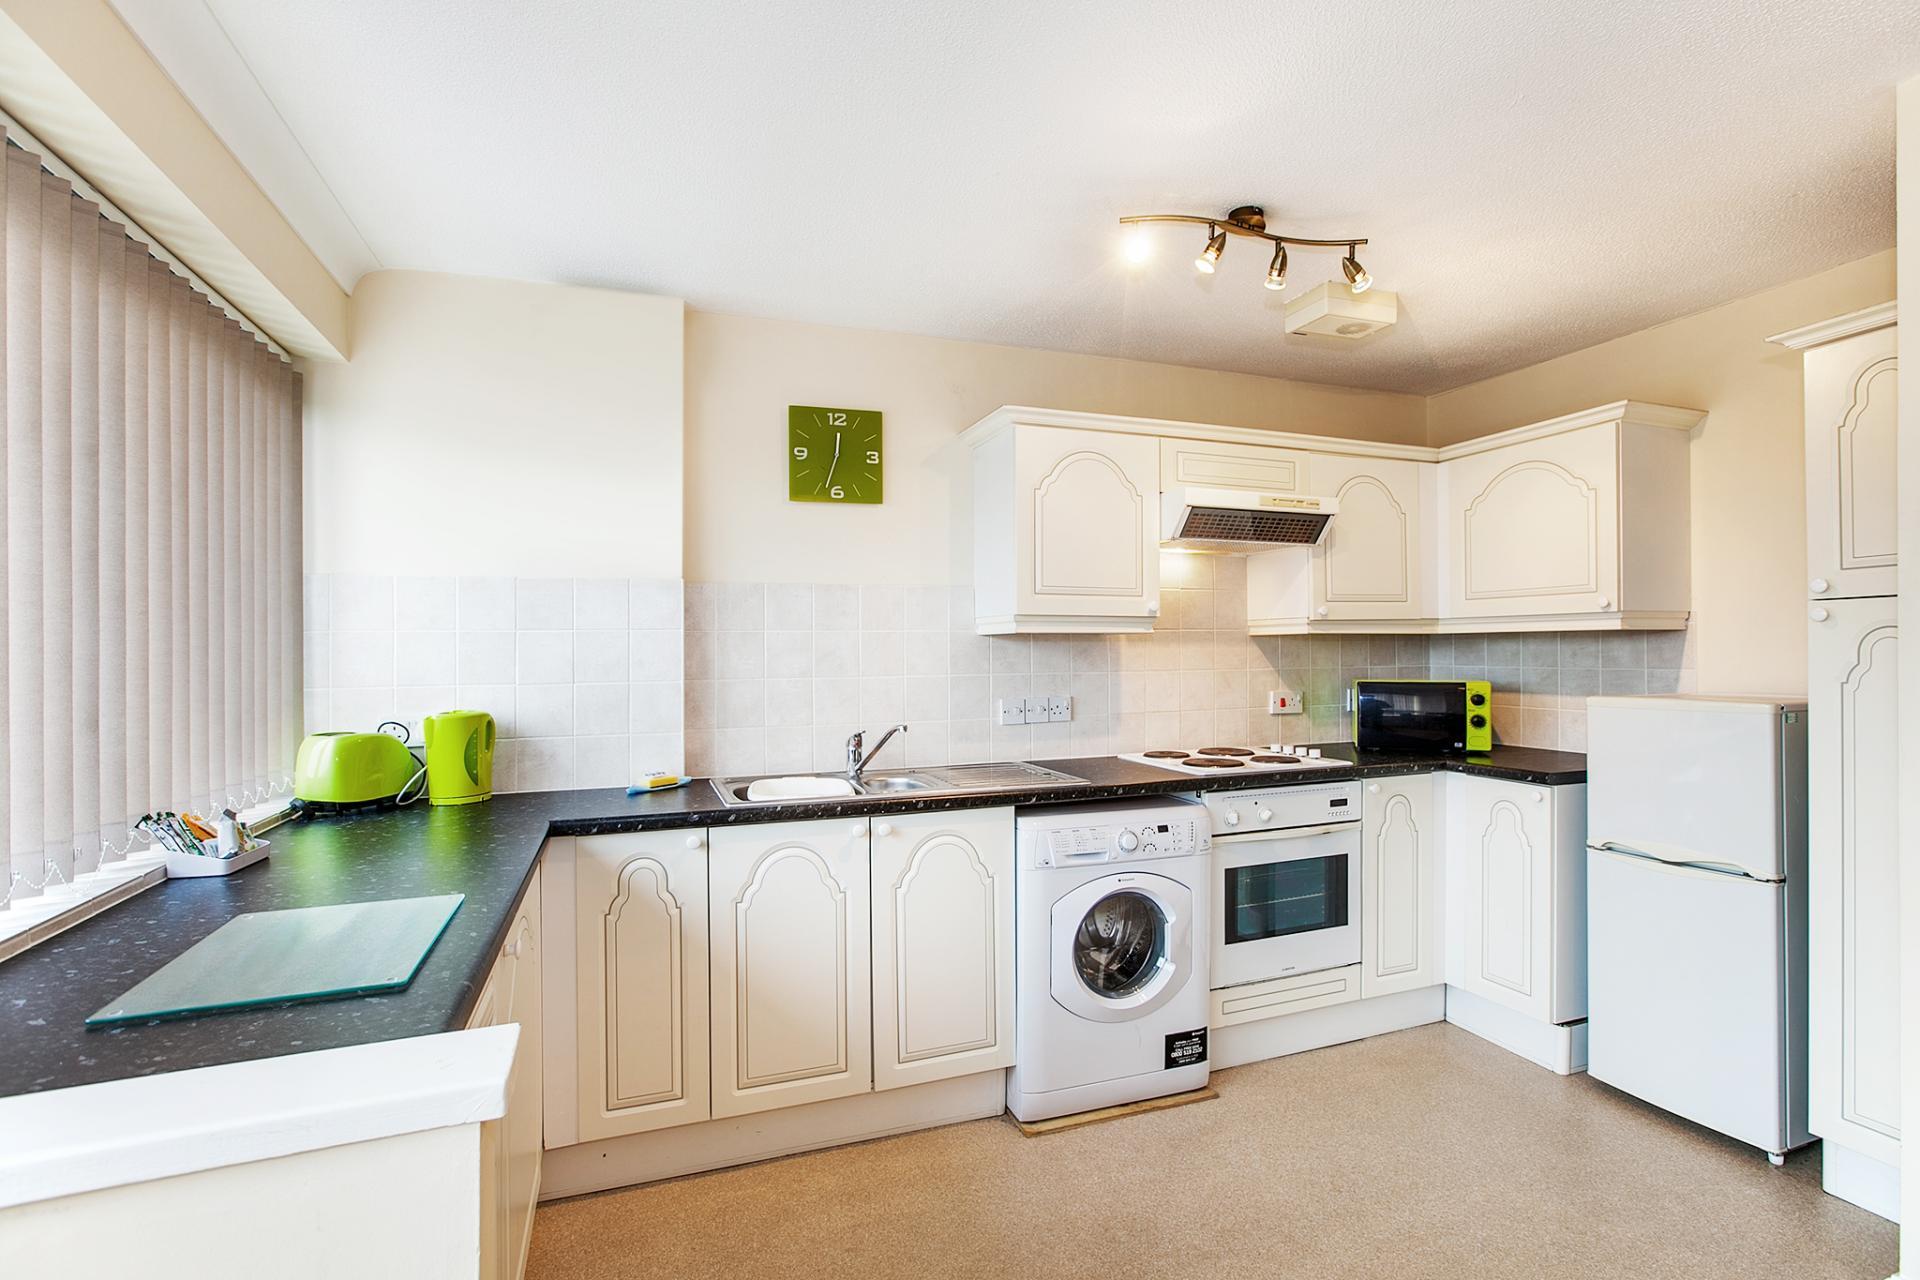 Kitchen at South Row Apartments